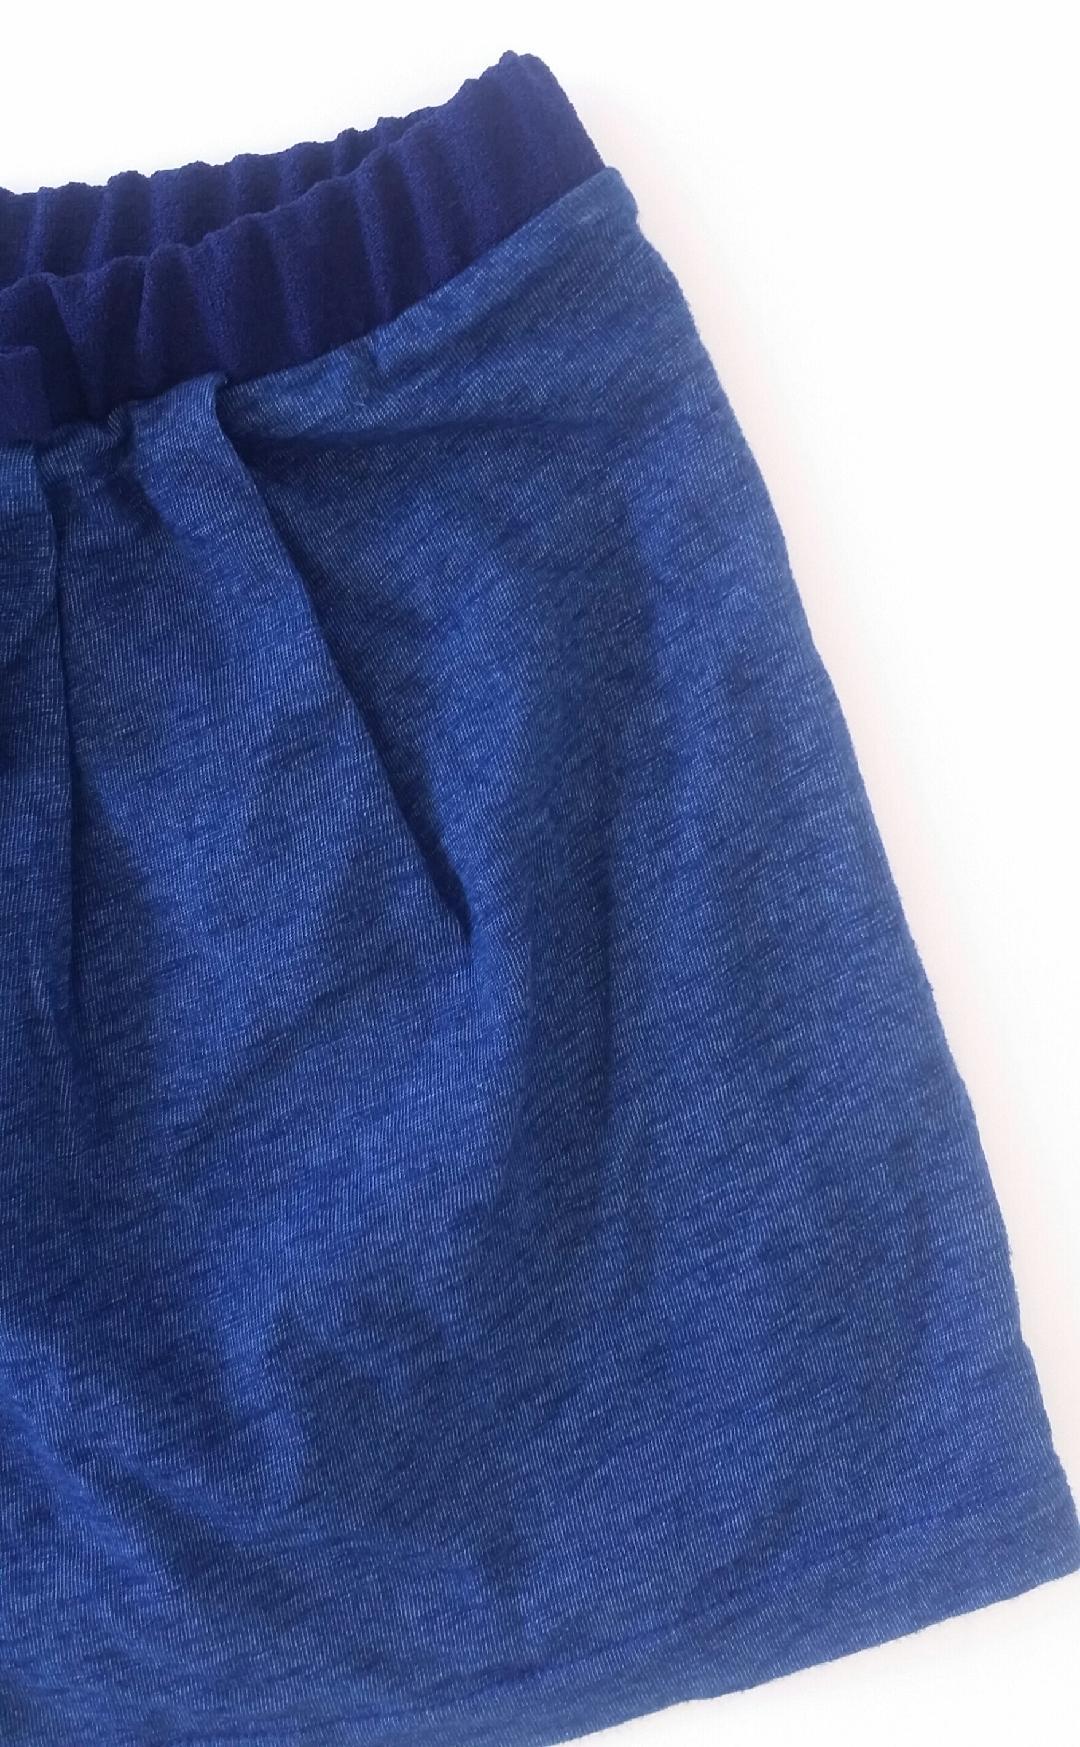 Zara-8-YEARS-Skirt_2139655B.jpg